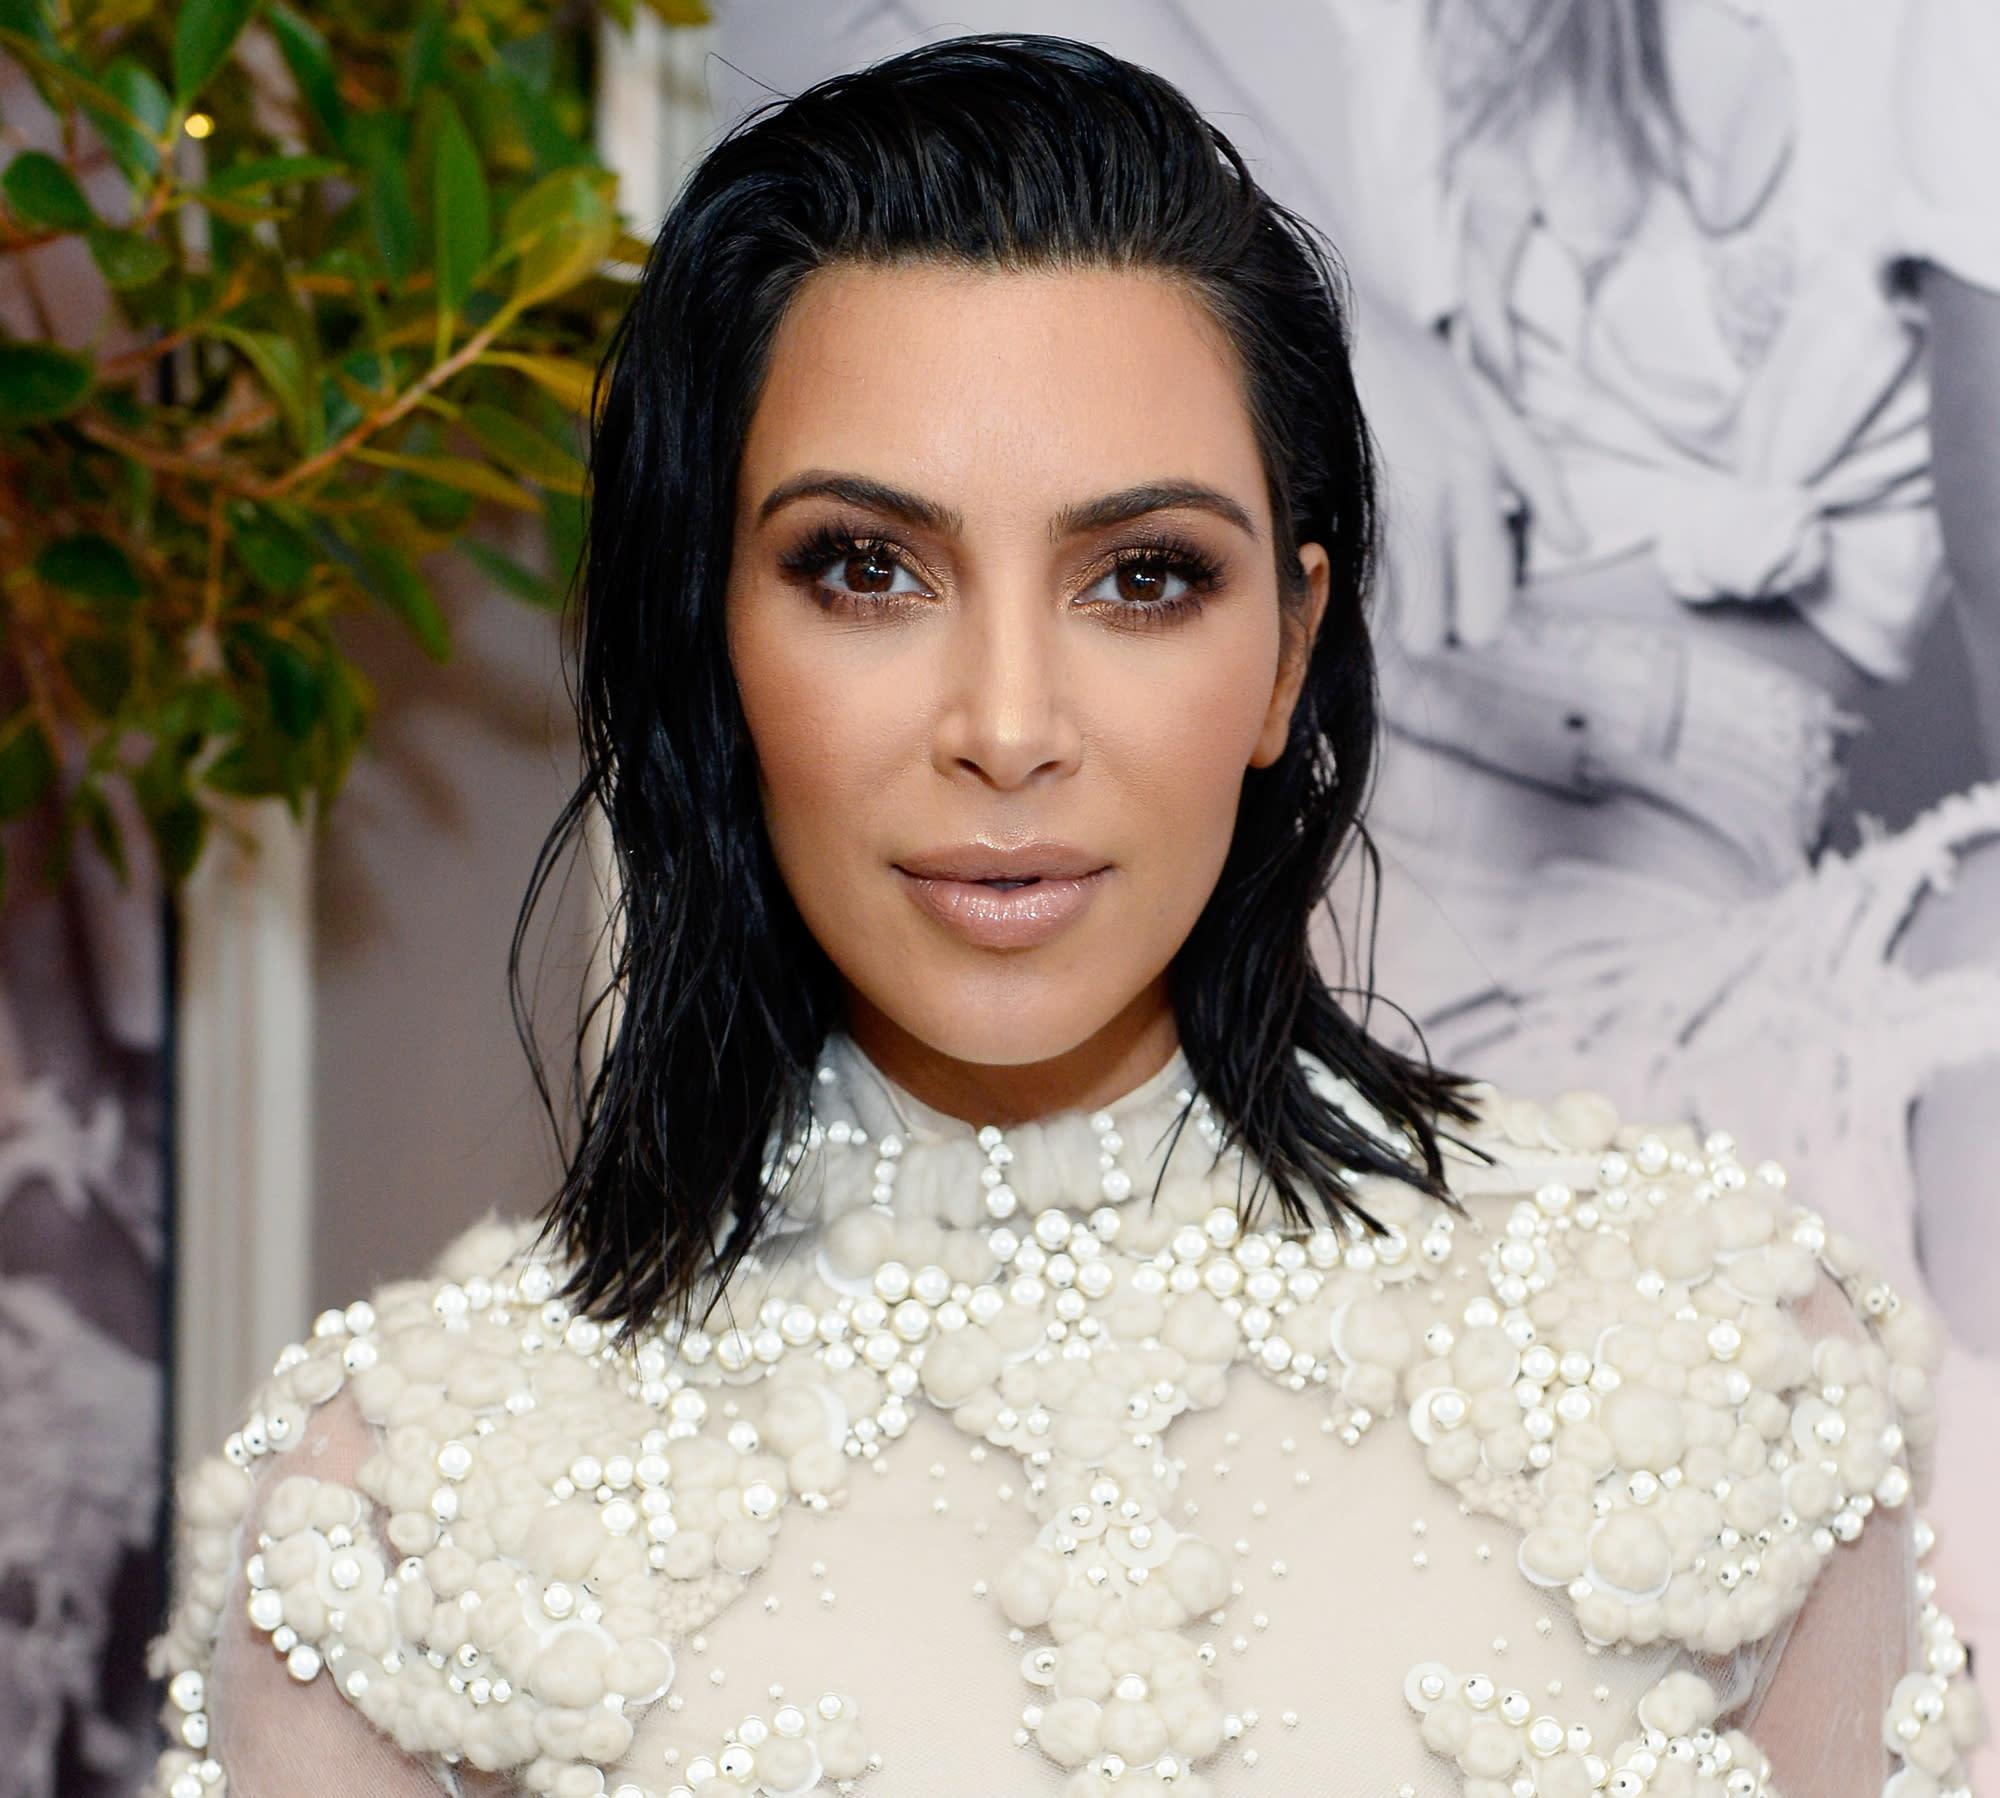 20 Photos of Kim Kardashian Tree - HattyPhoto.com